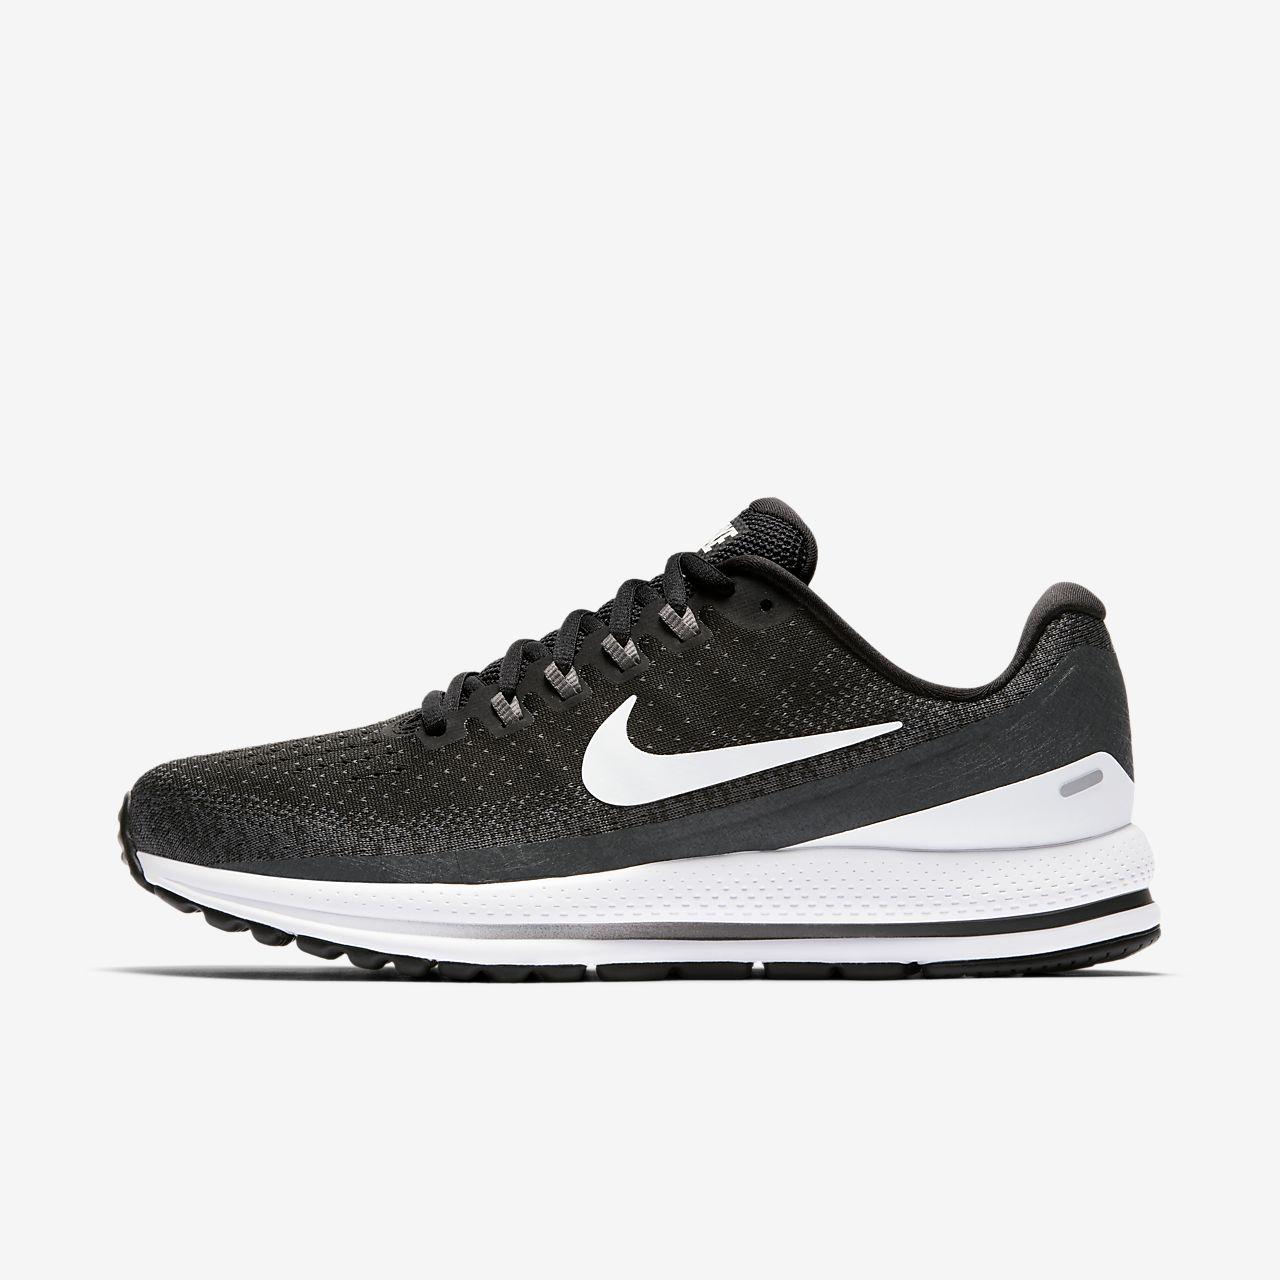 running shoes for men menu0027s running shoe. $110. prev rmktzun